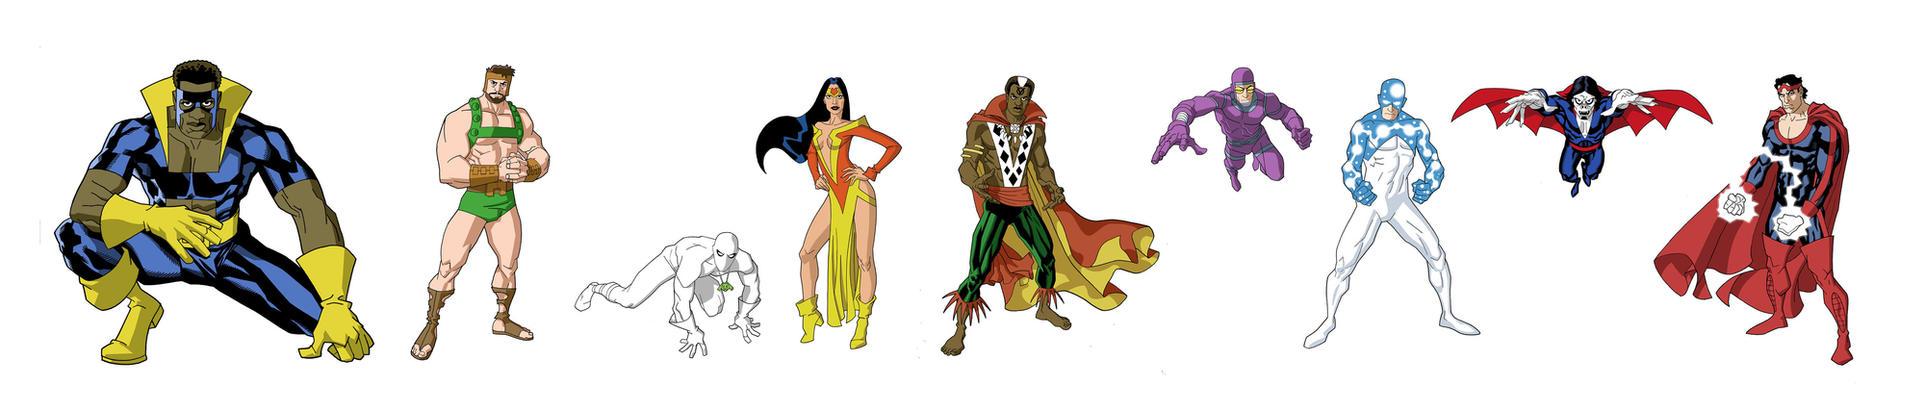 odd assortment of Marvel heroe by dusty-abell